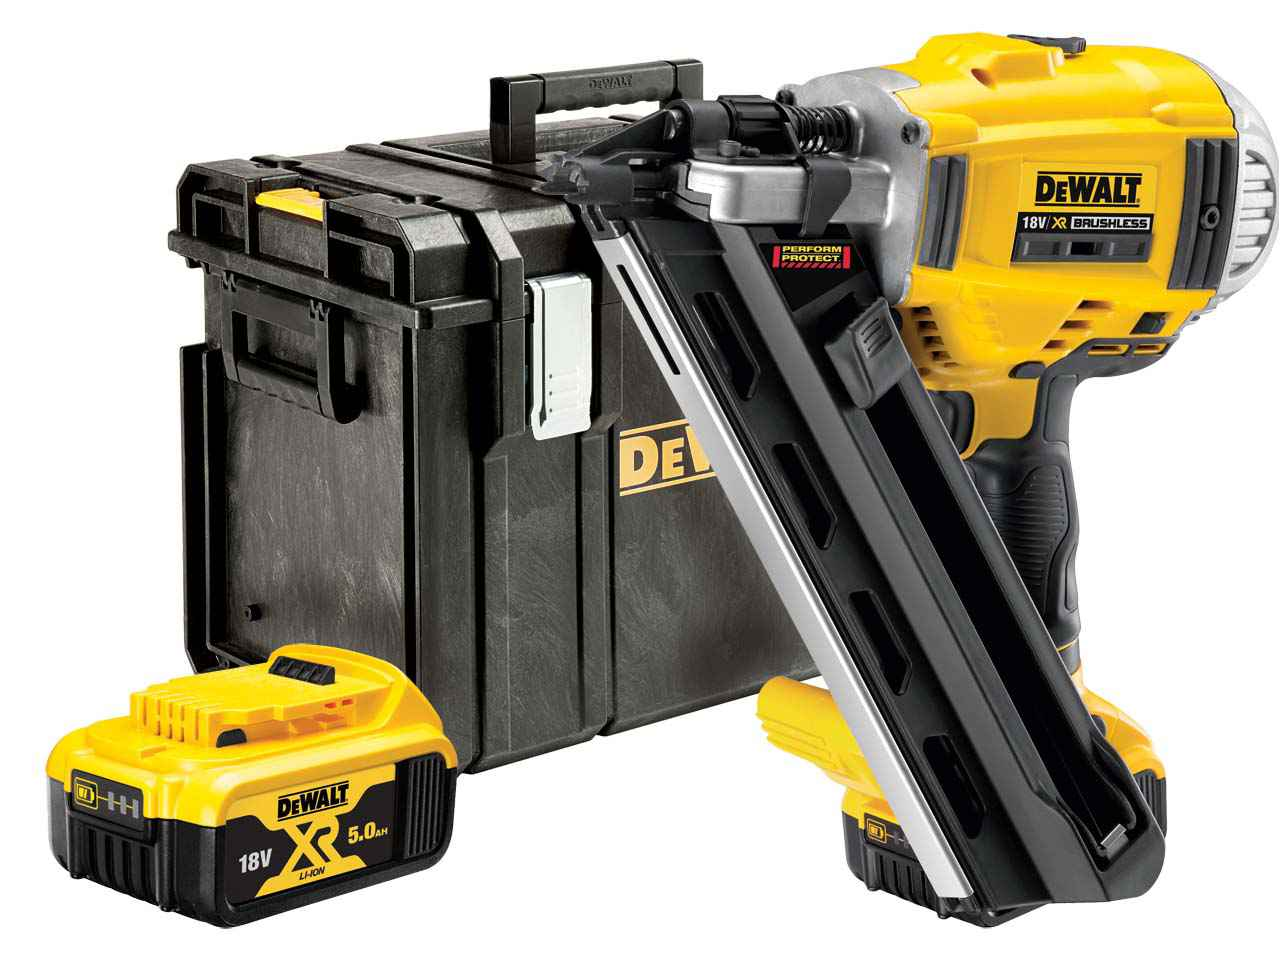 DeWalt DCN692P2 18v 2x5.0 Li-ion Brushless XR Nail Gun Kit